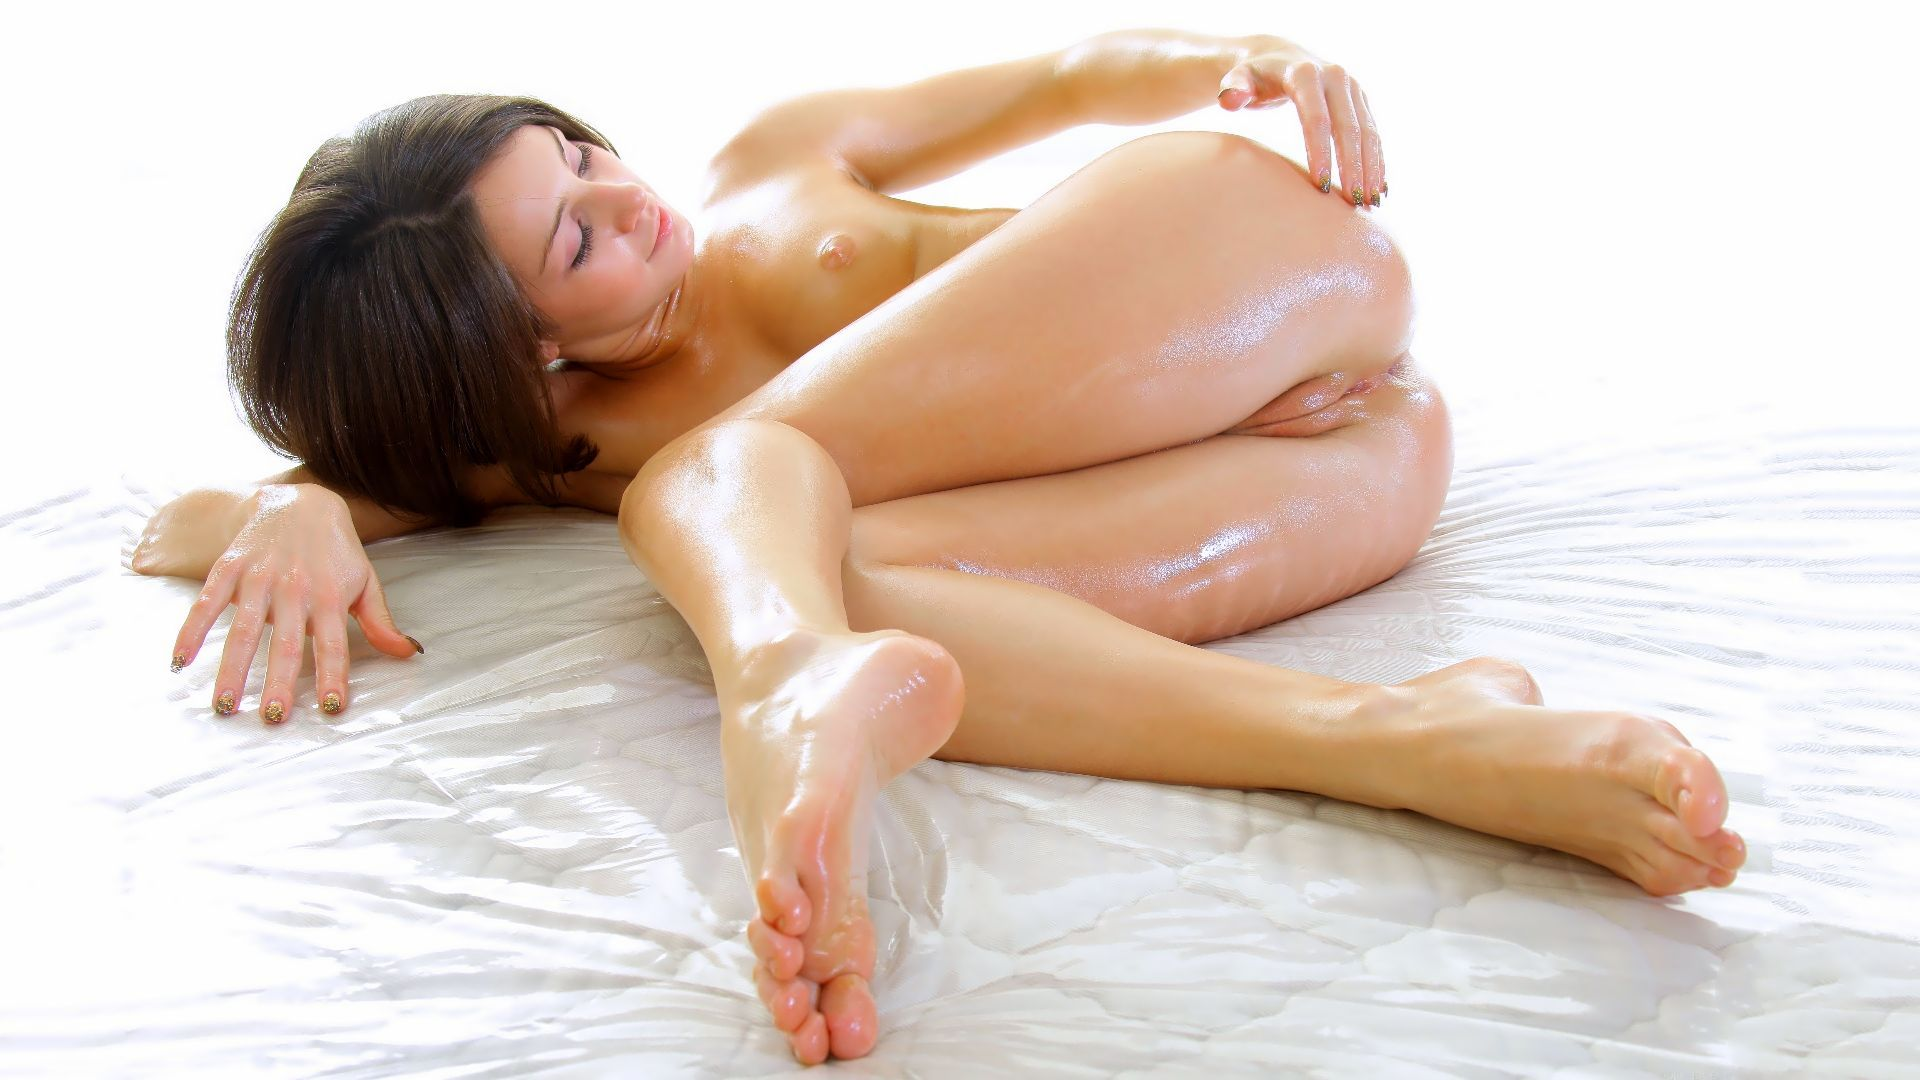 порно фото масляных девушек